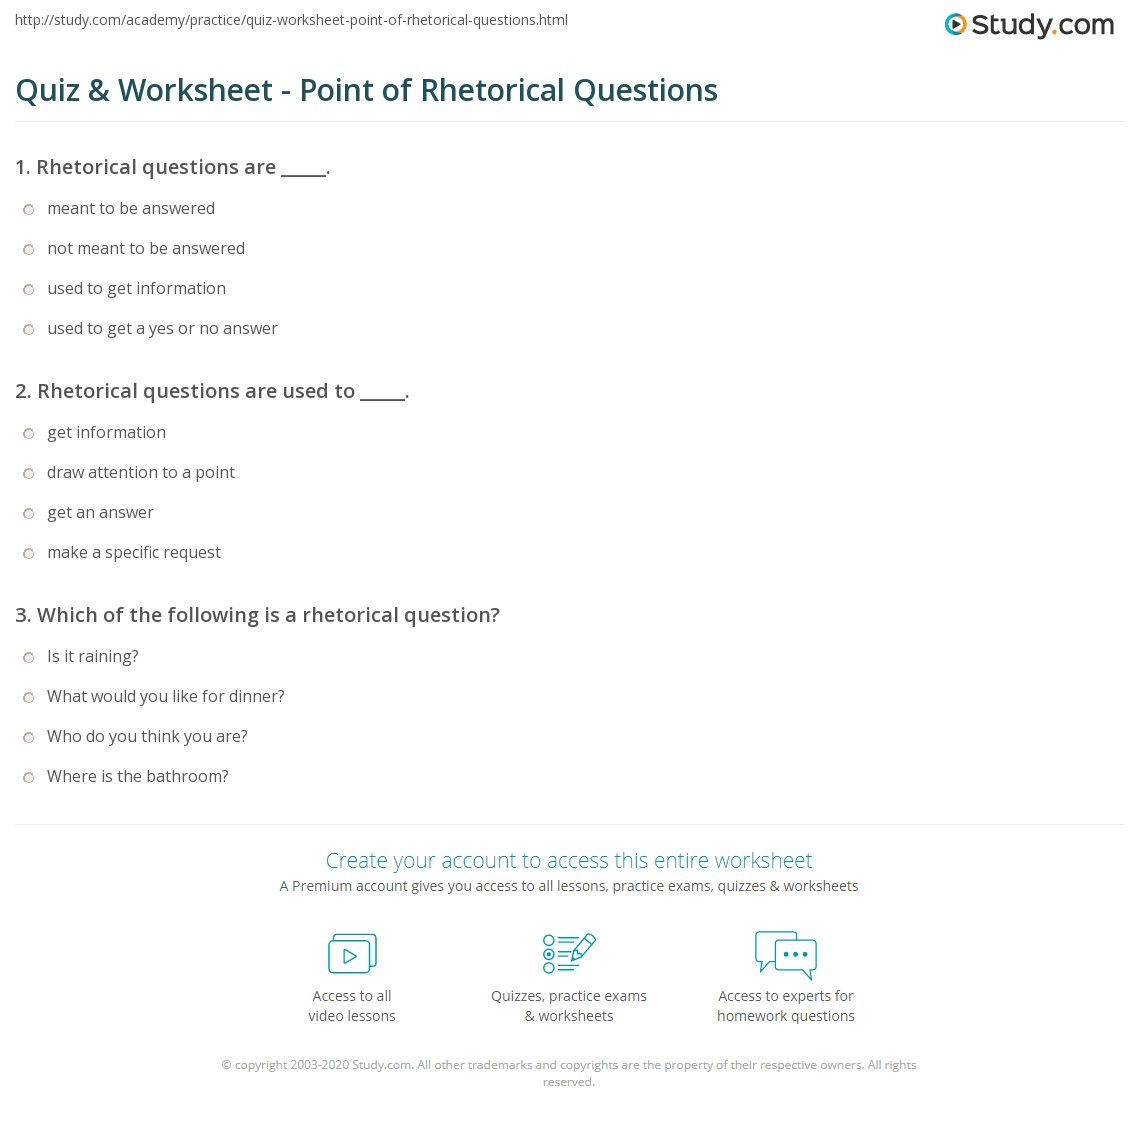 Quiz & Worksheet - Point of Rhetorical Questions | Study.com